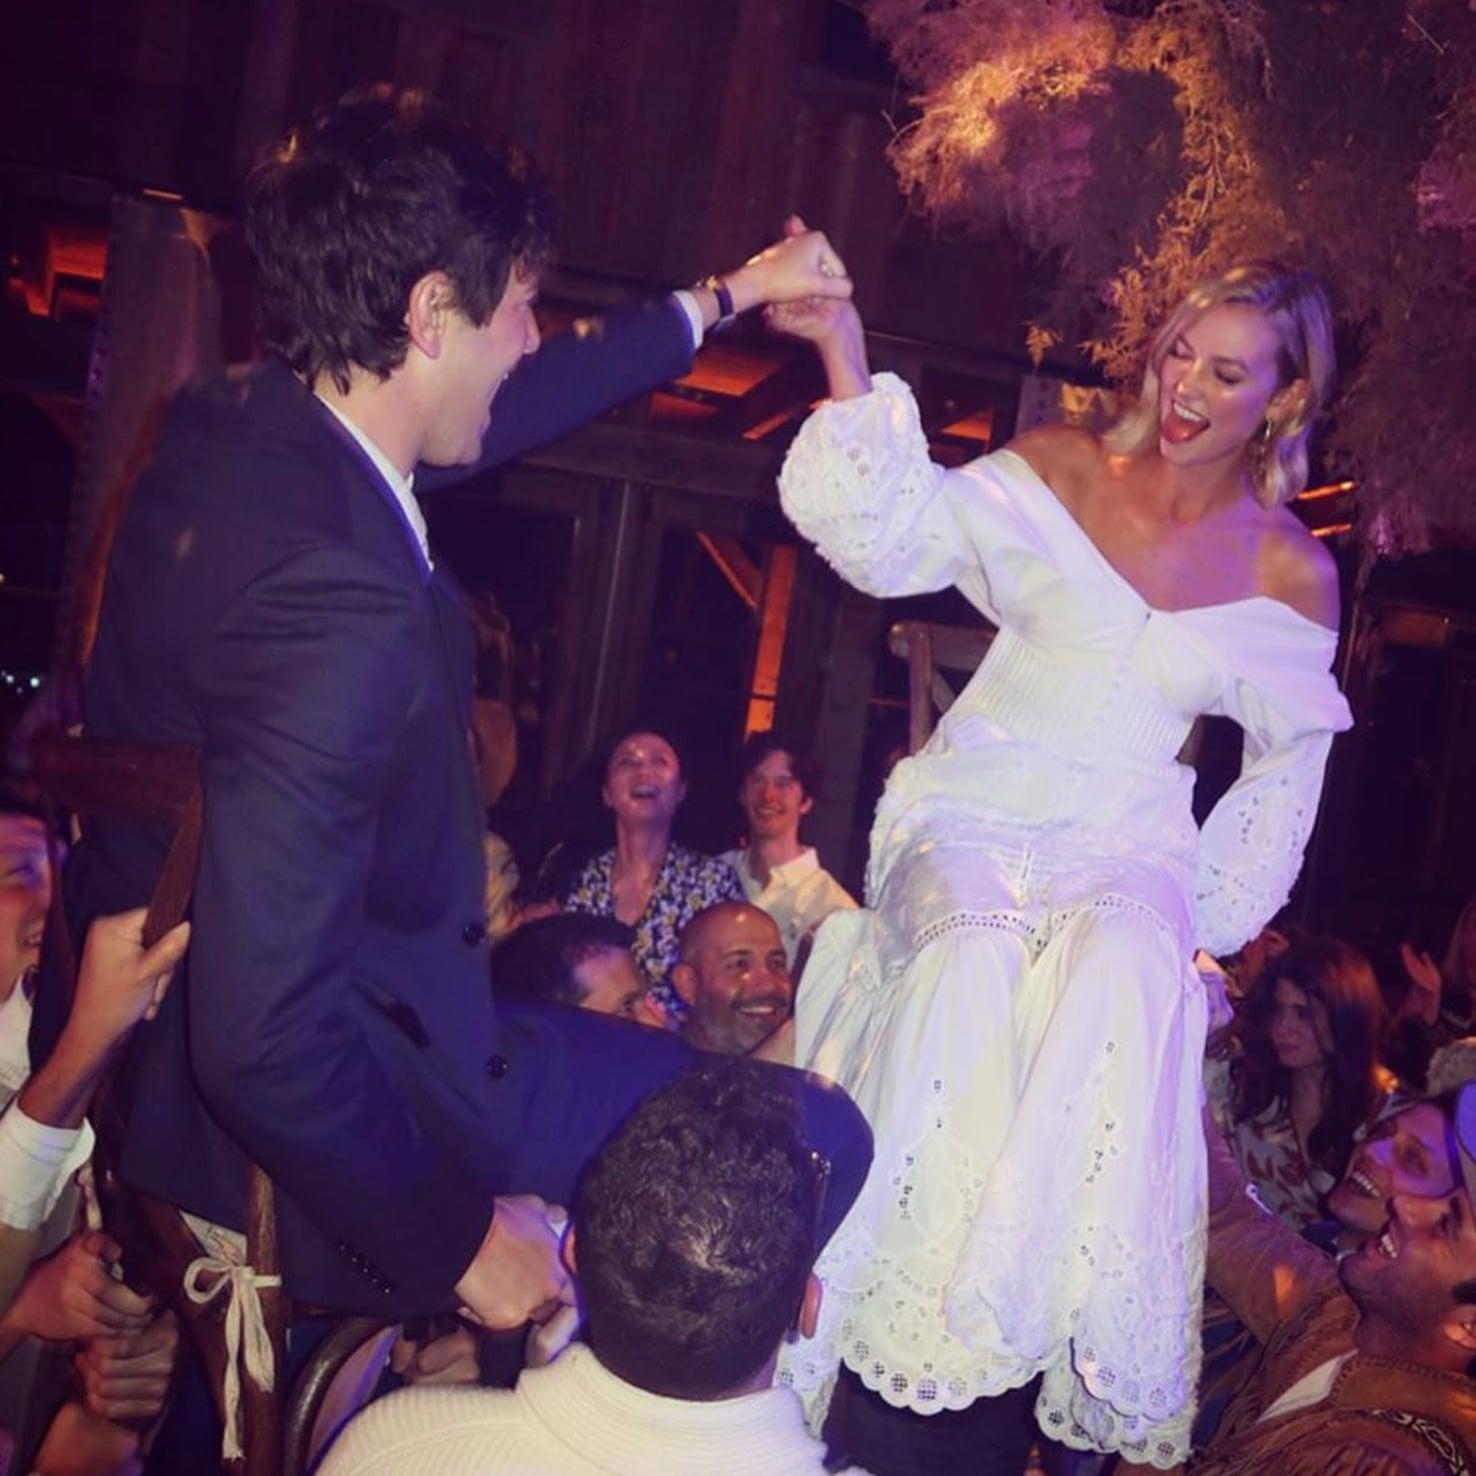 Karlie Kloss's Second Wedding Dress | POPSUGAR Fashion UK